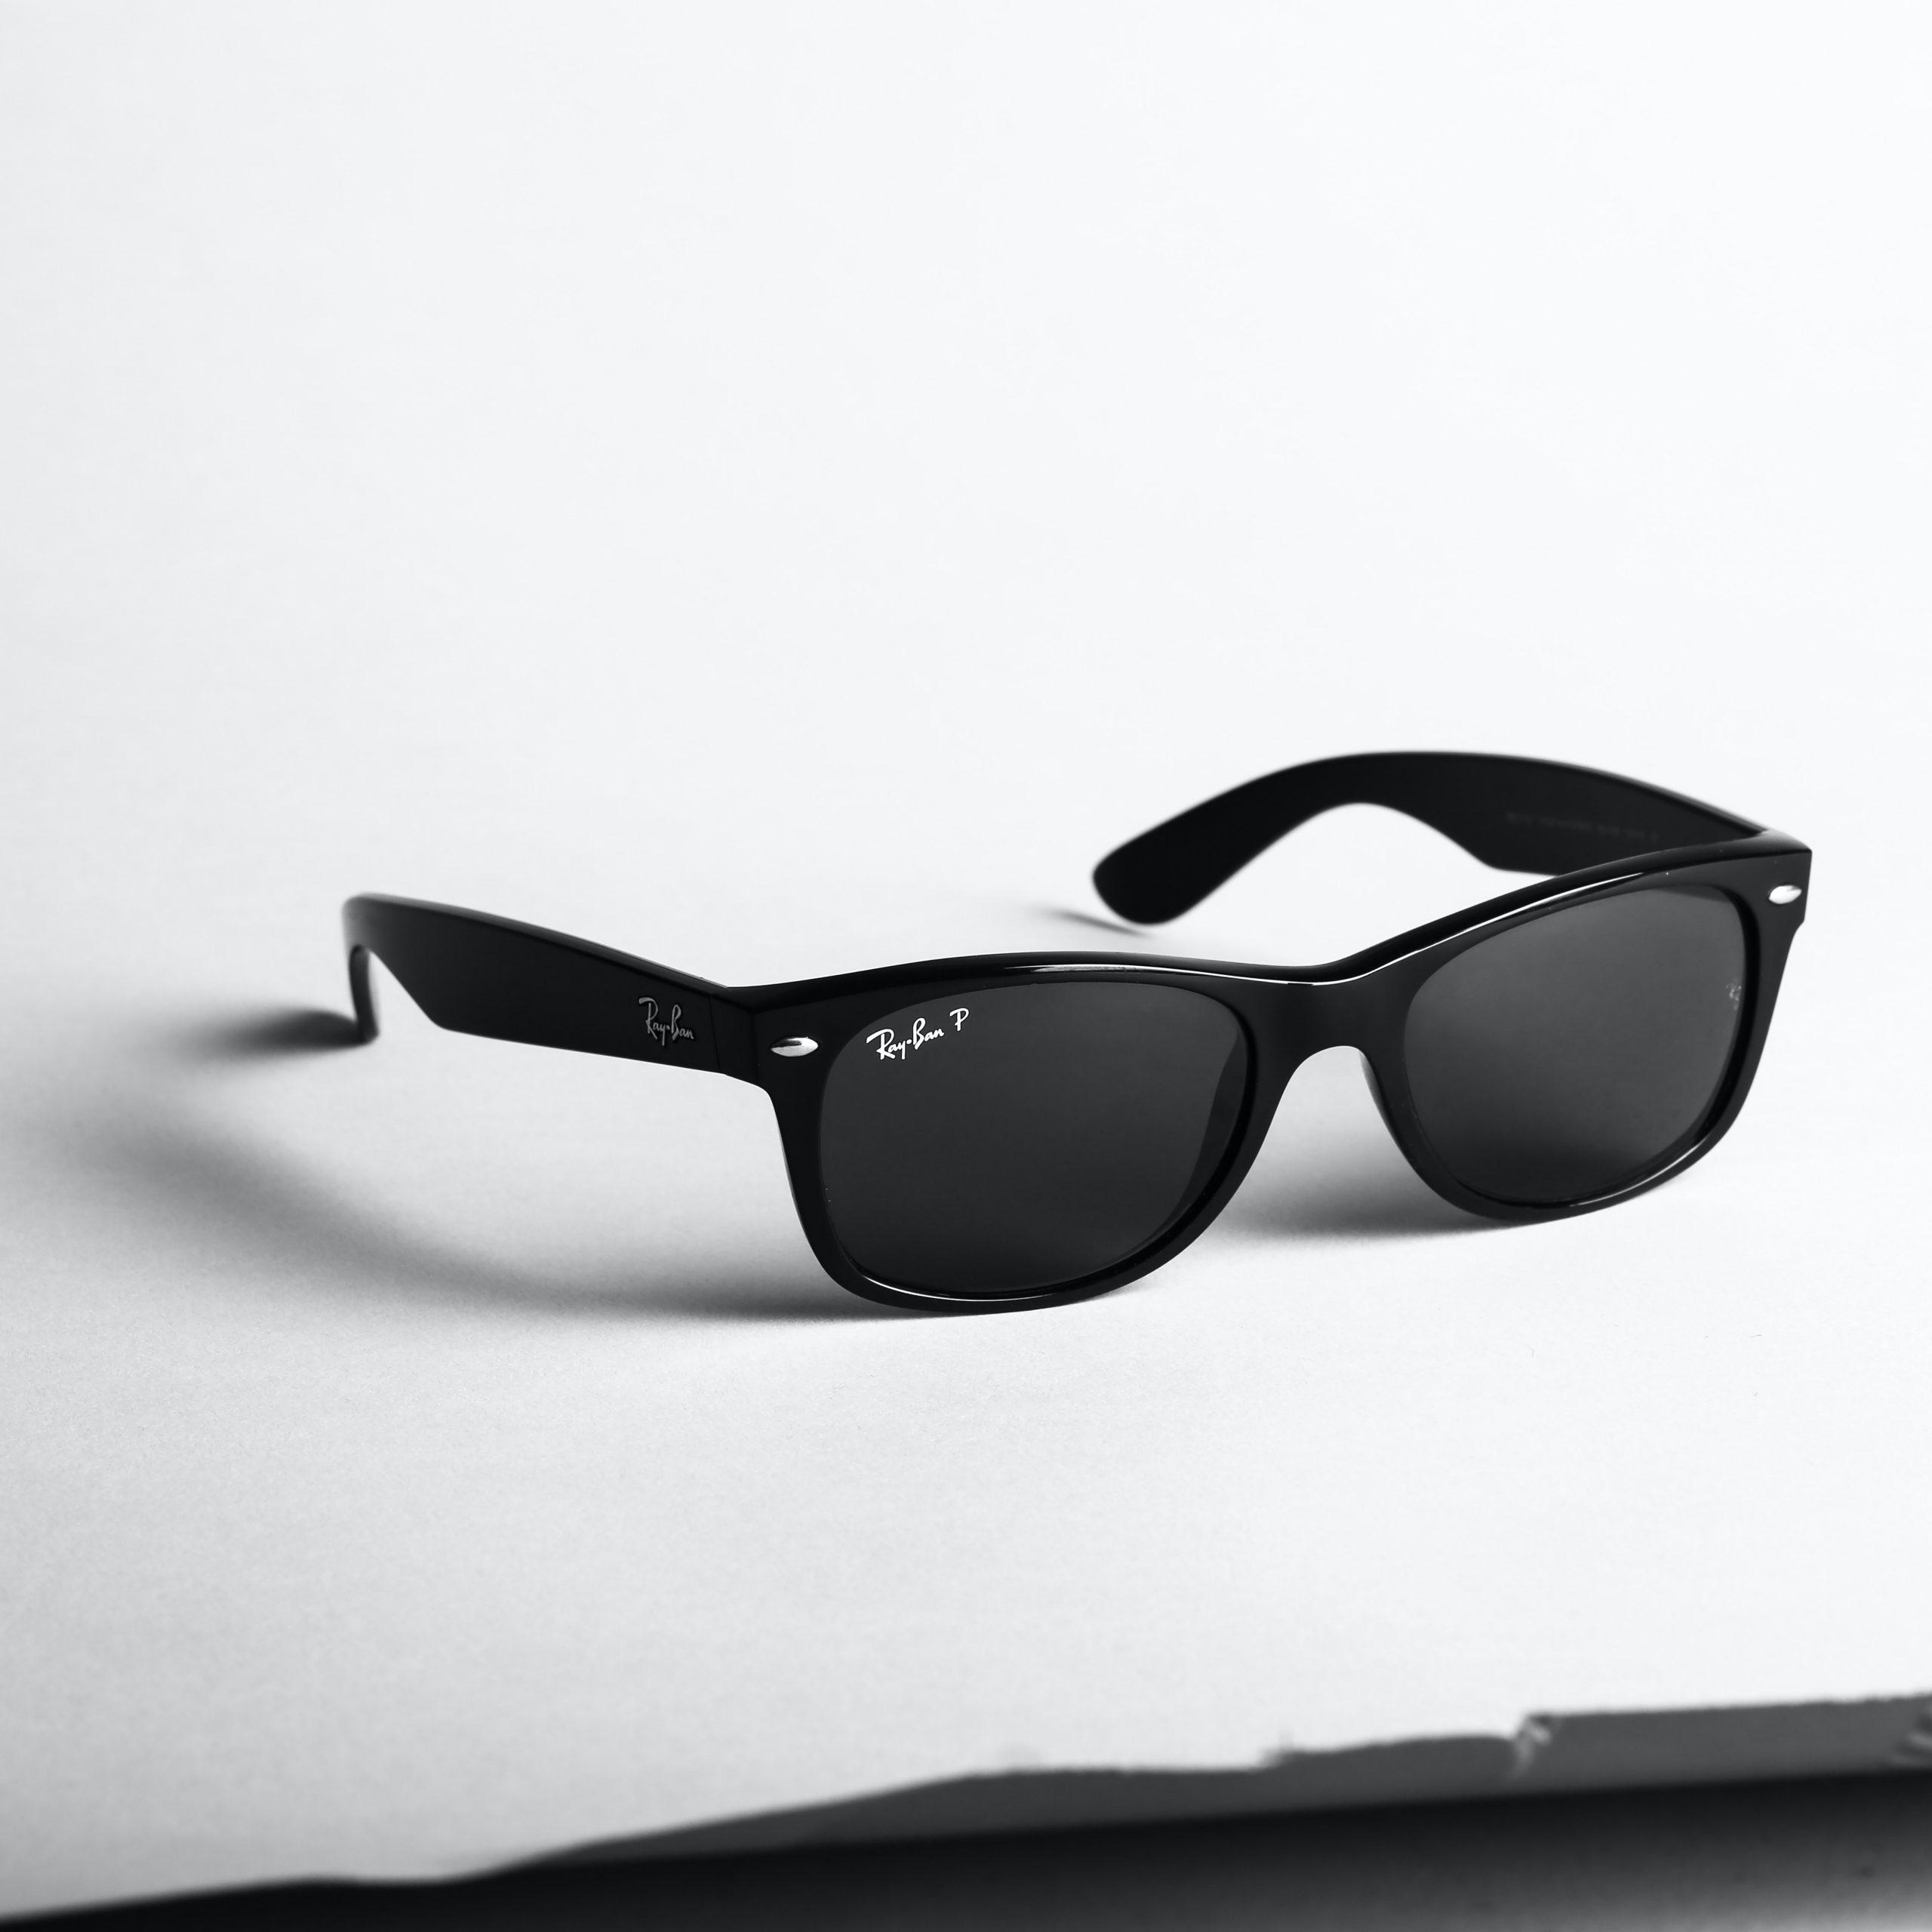 """Polarized sunglasses for all"""